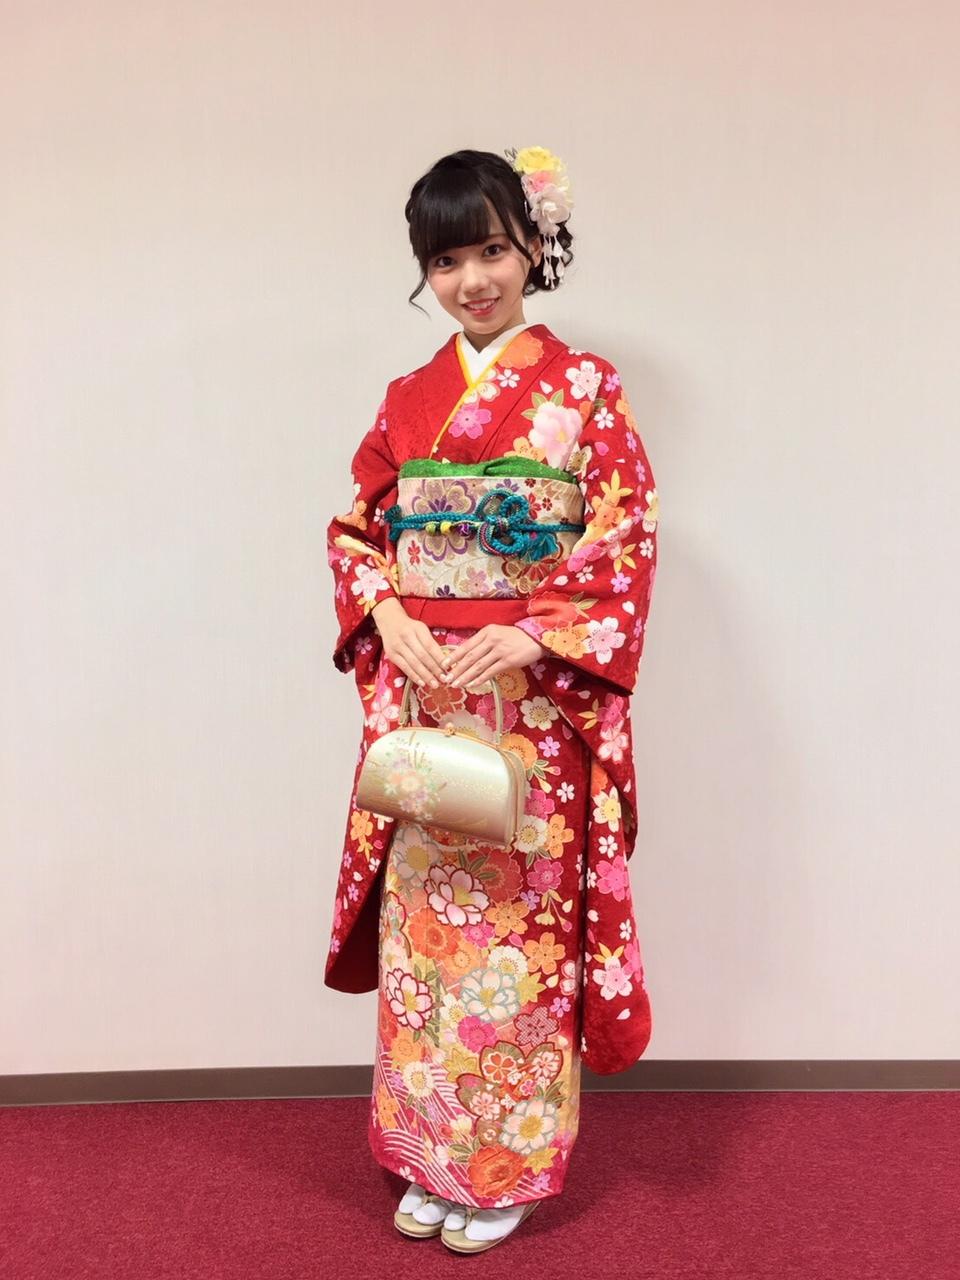 http://cdn.keyakizaka46.com/files/14/diary/k46/member/moblog/201801/mobvUSxnq.jpg